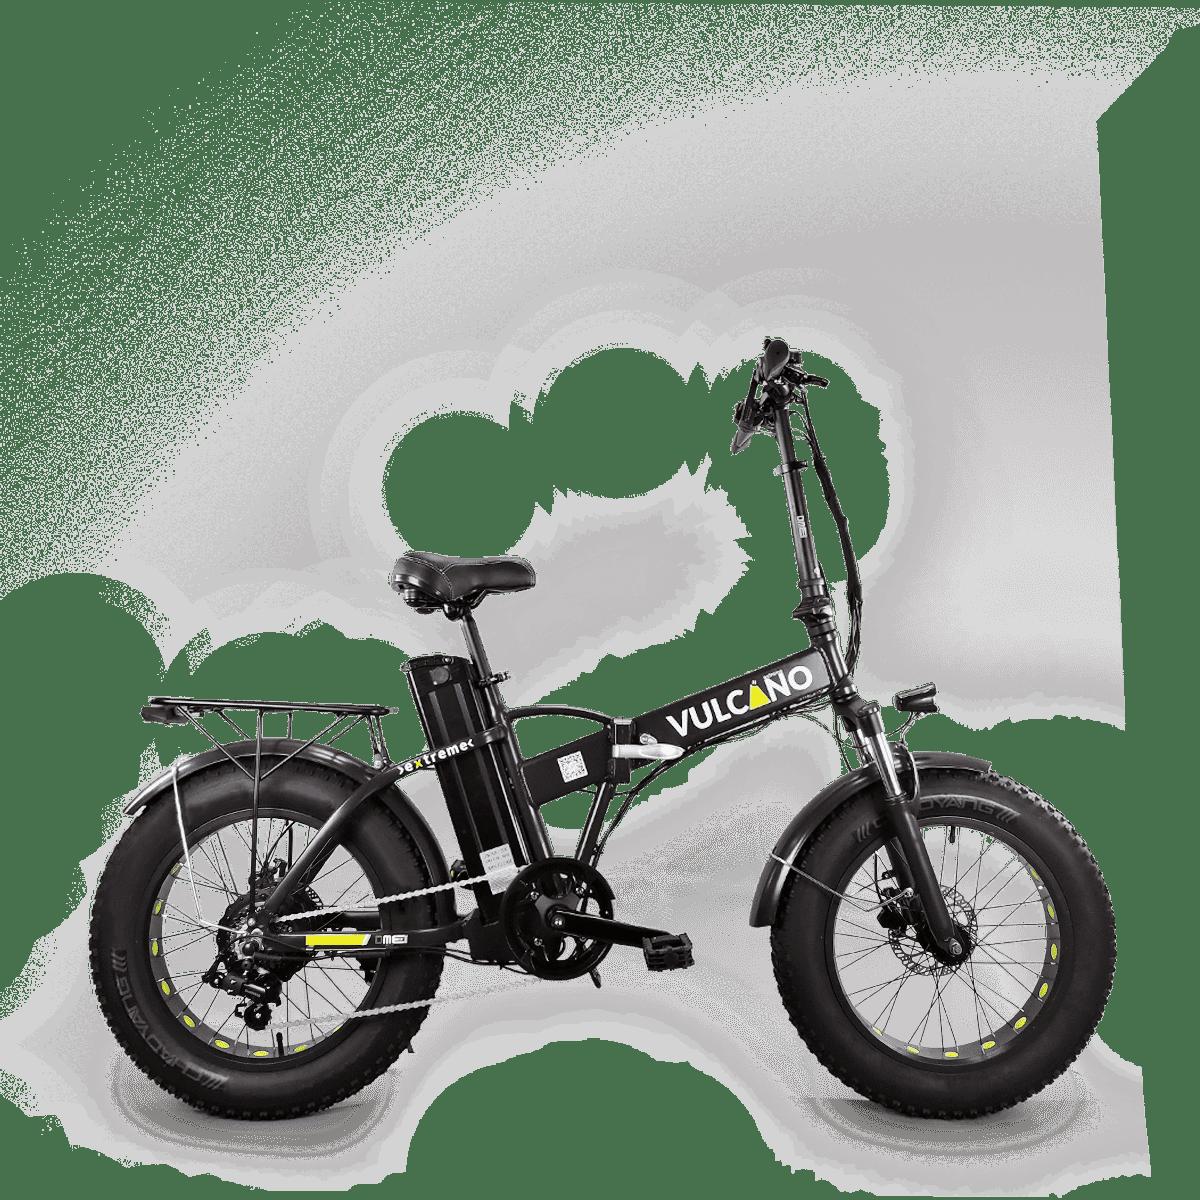 Bici Elettrica Fat Bike Vulcano Extreme V272 500w 48v Dme